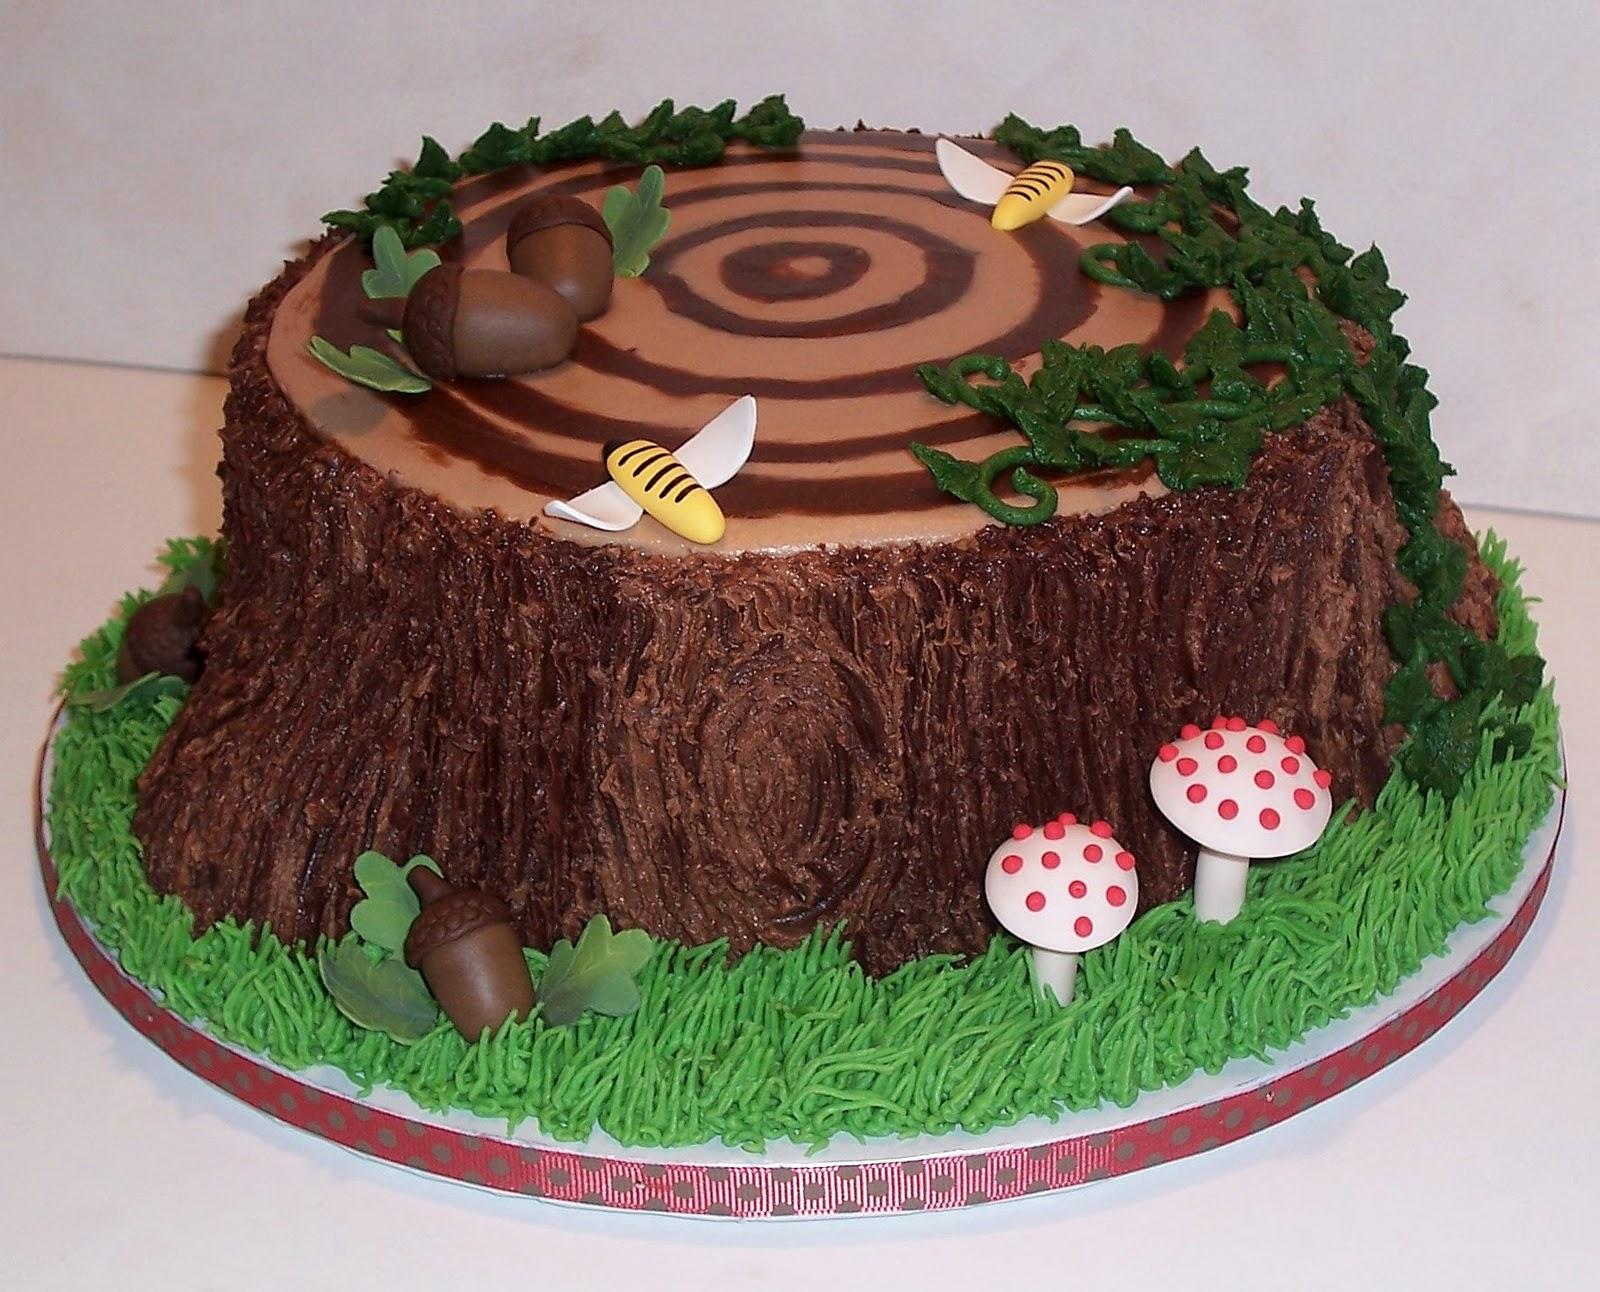 Chocolate Cake Tree Stumps Cake Ideas Baking Ideas